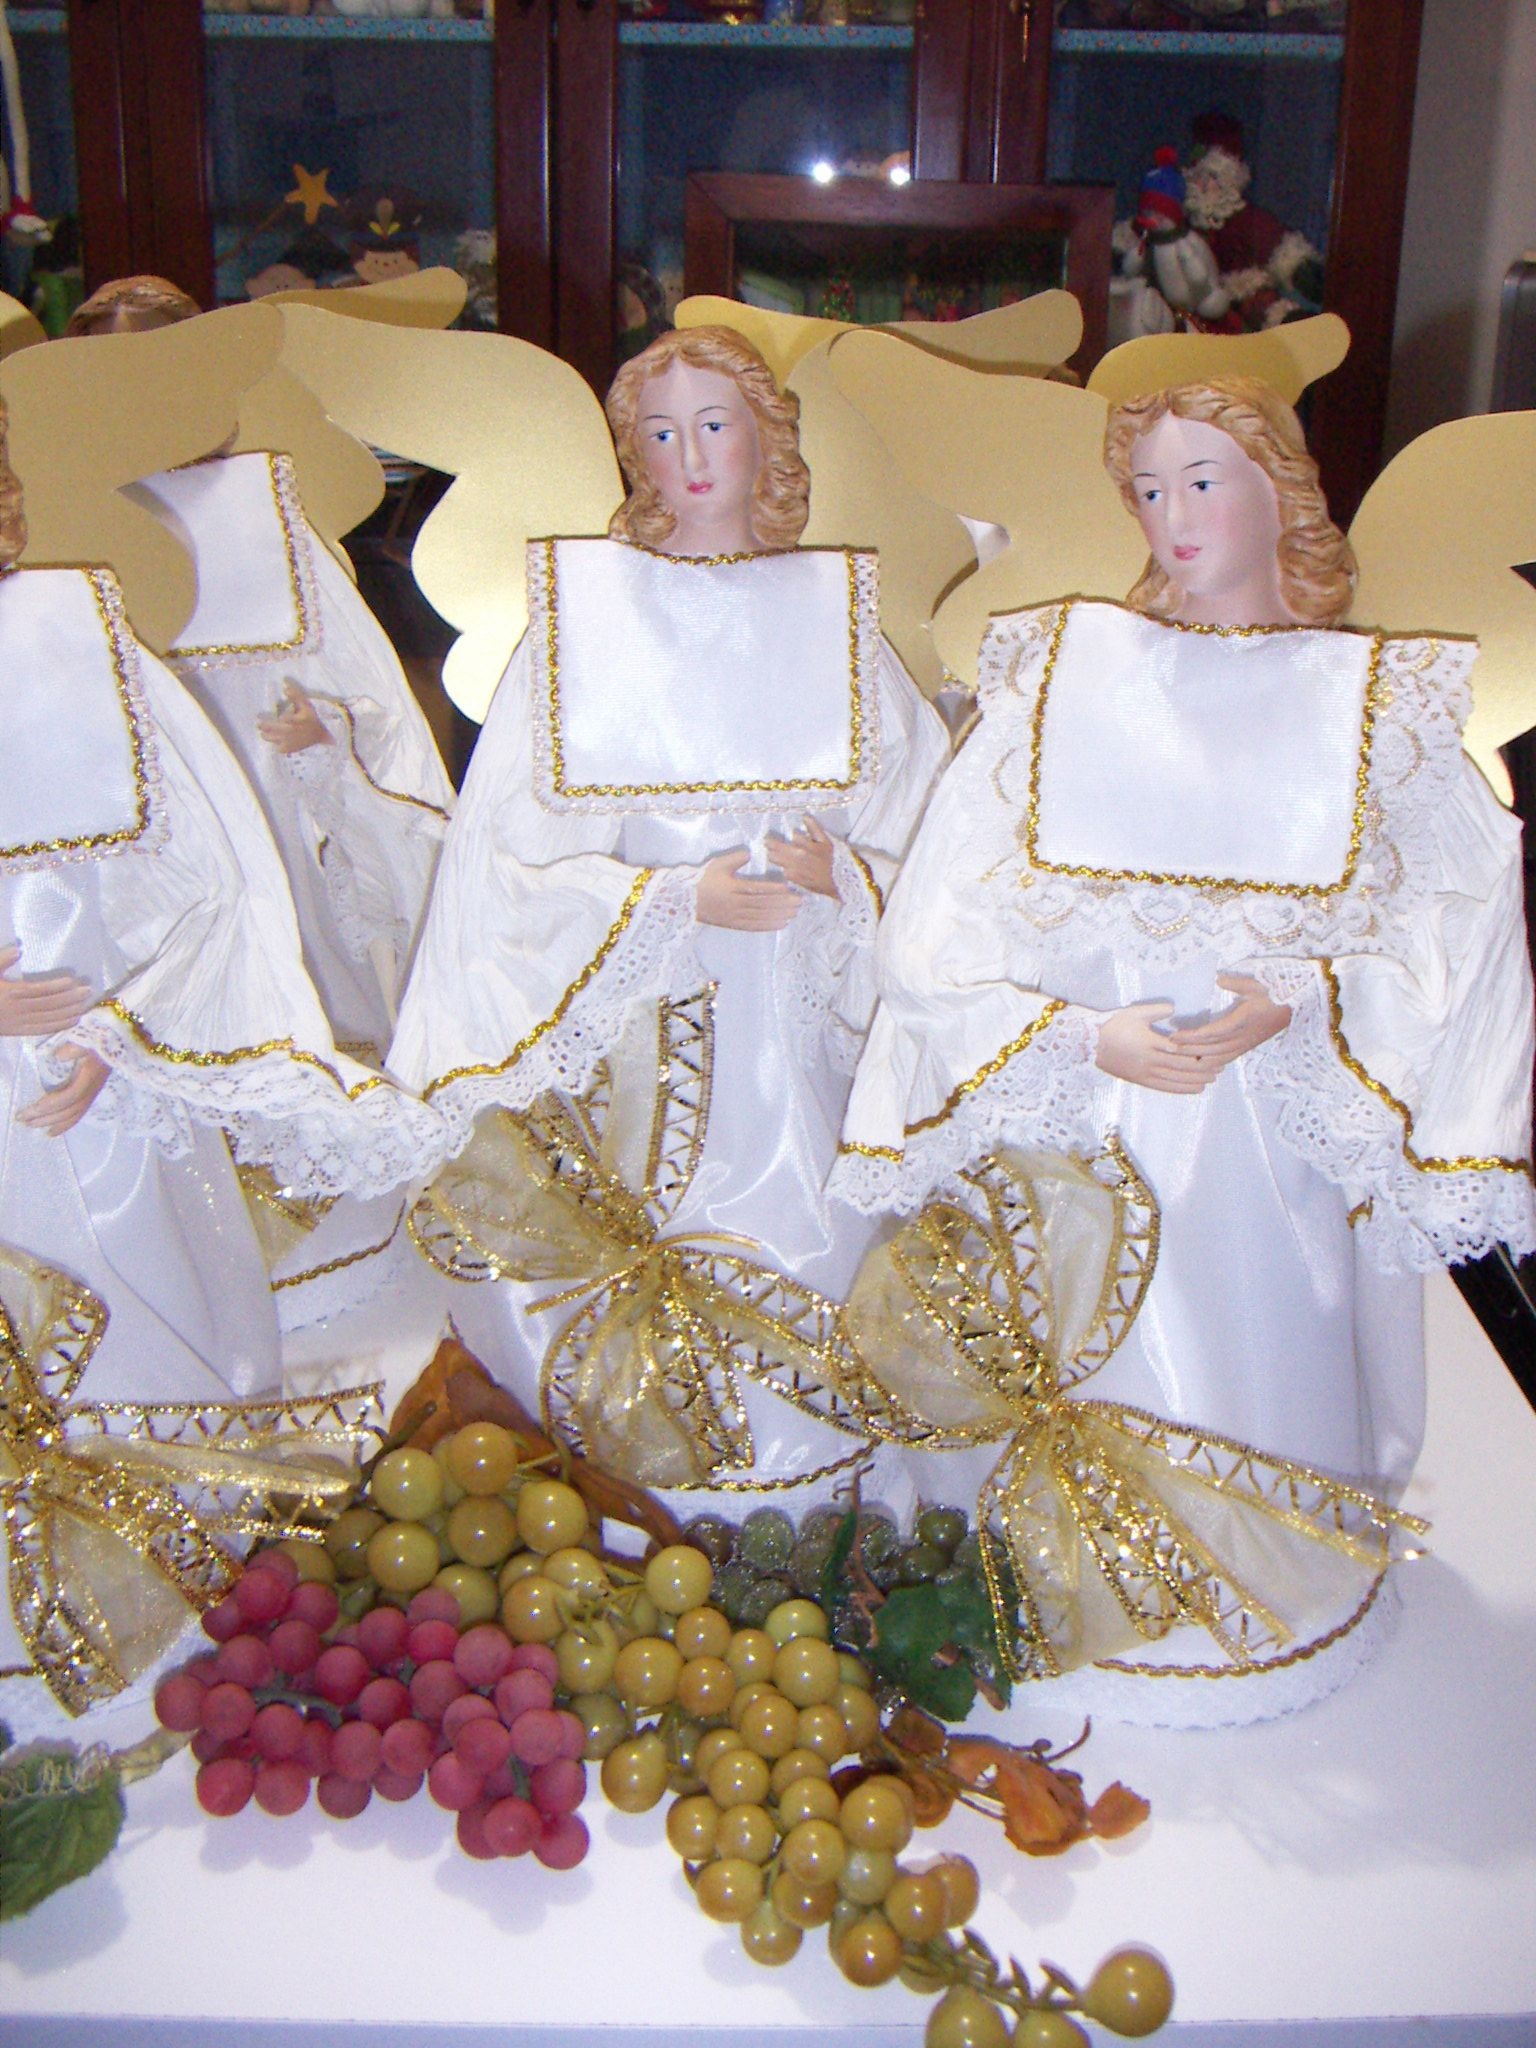 angeles para decorar centro de mesa en primera comunion scrapbook first communion pinterest. Black Bedroom Furniture Sets. Home Design Ideas